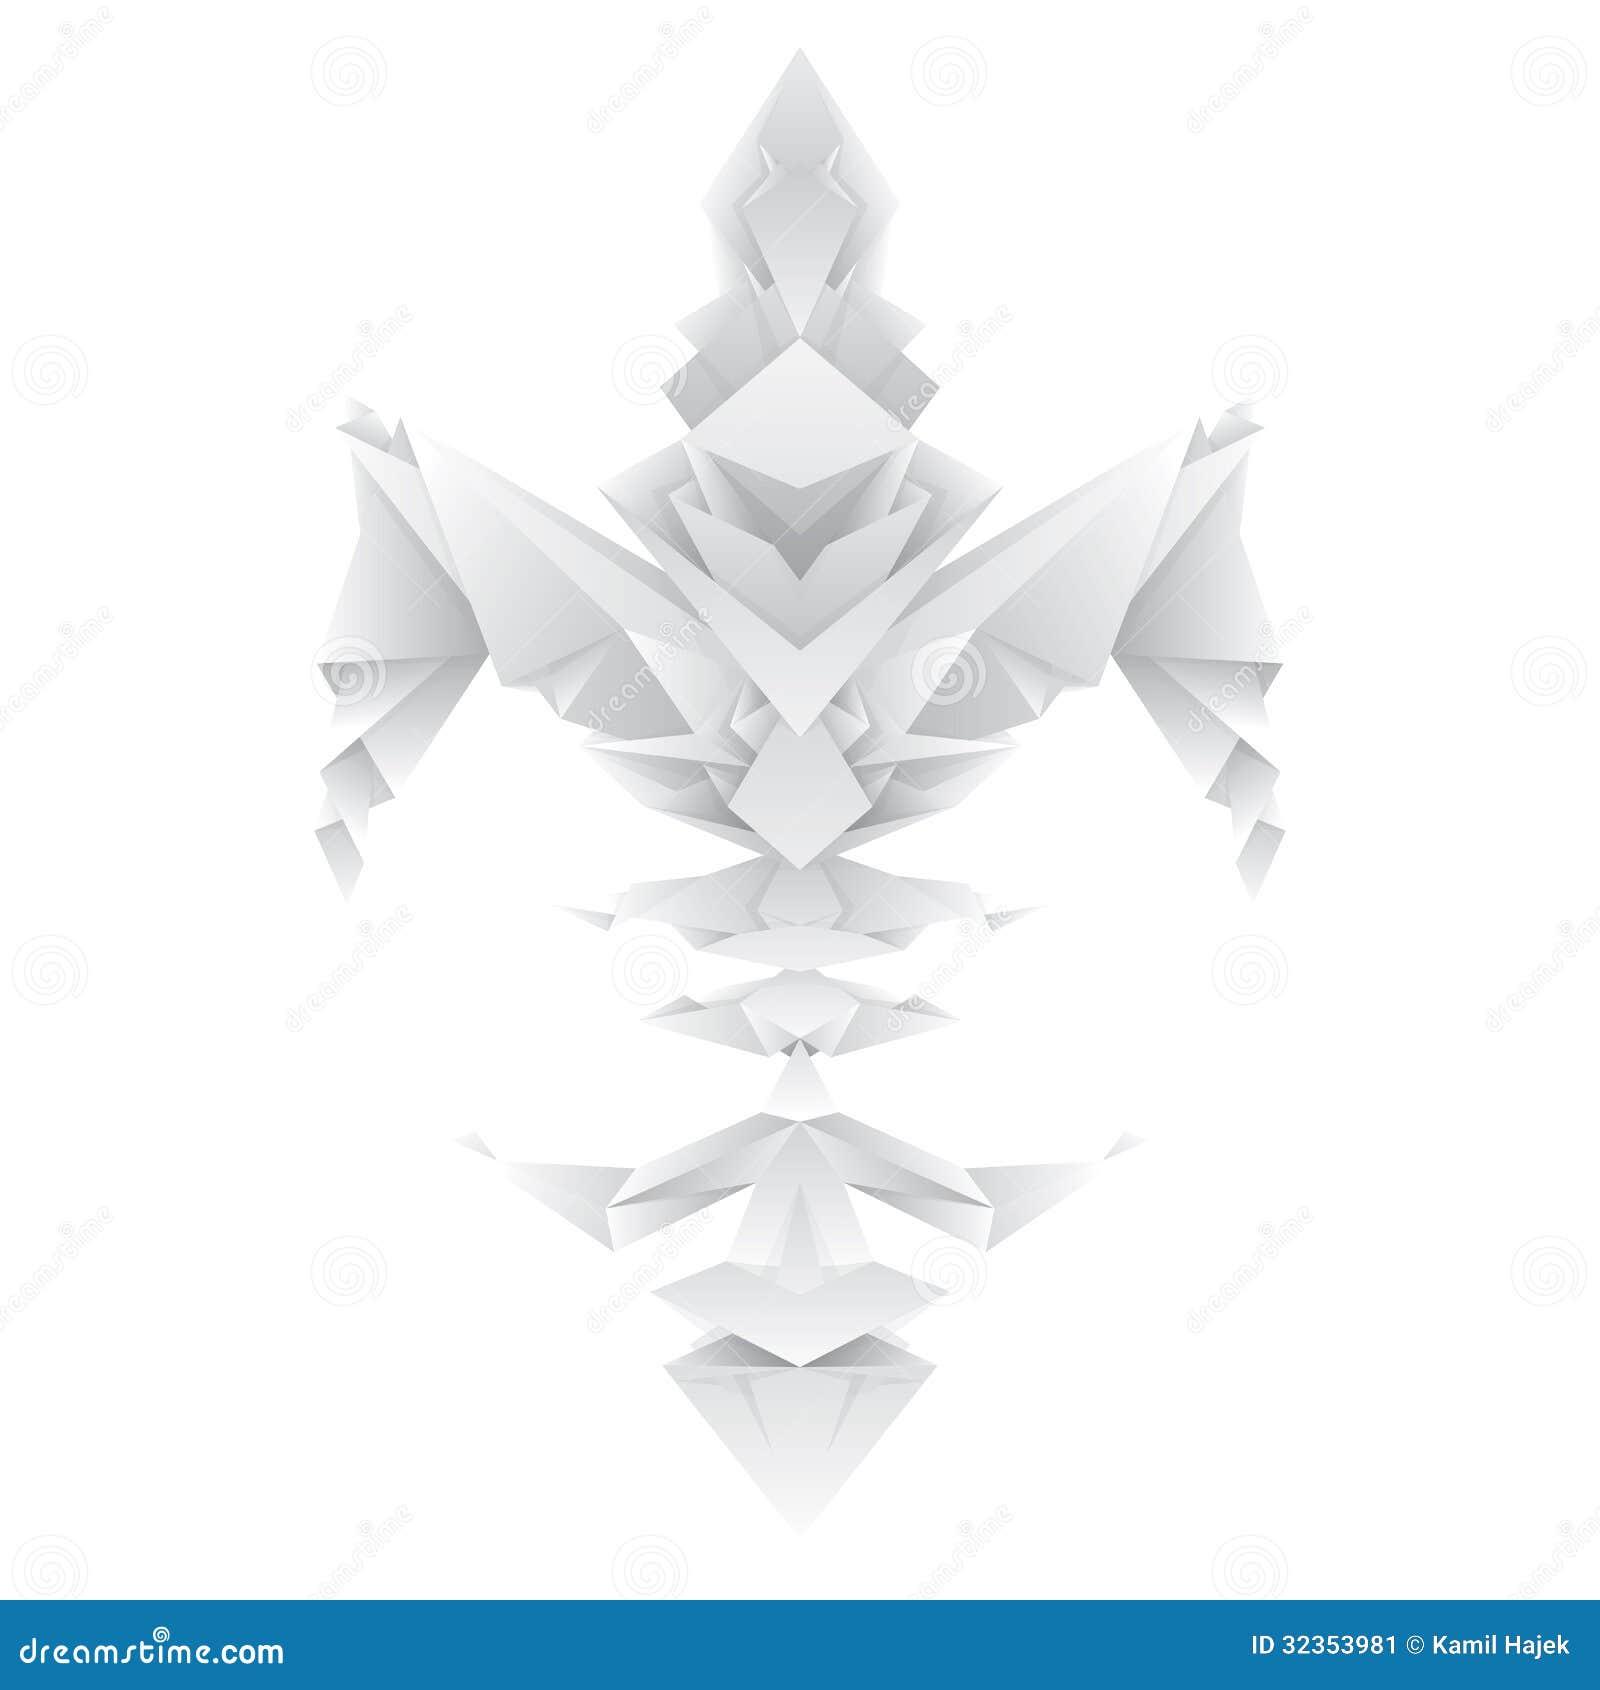 Lys En Origami fleur de lys in origami style illustration 32353981 - megapixl